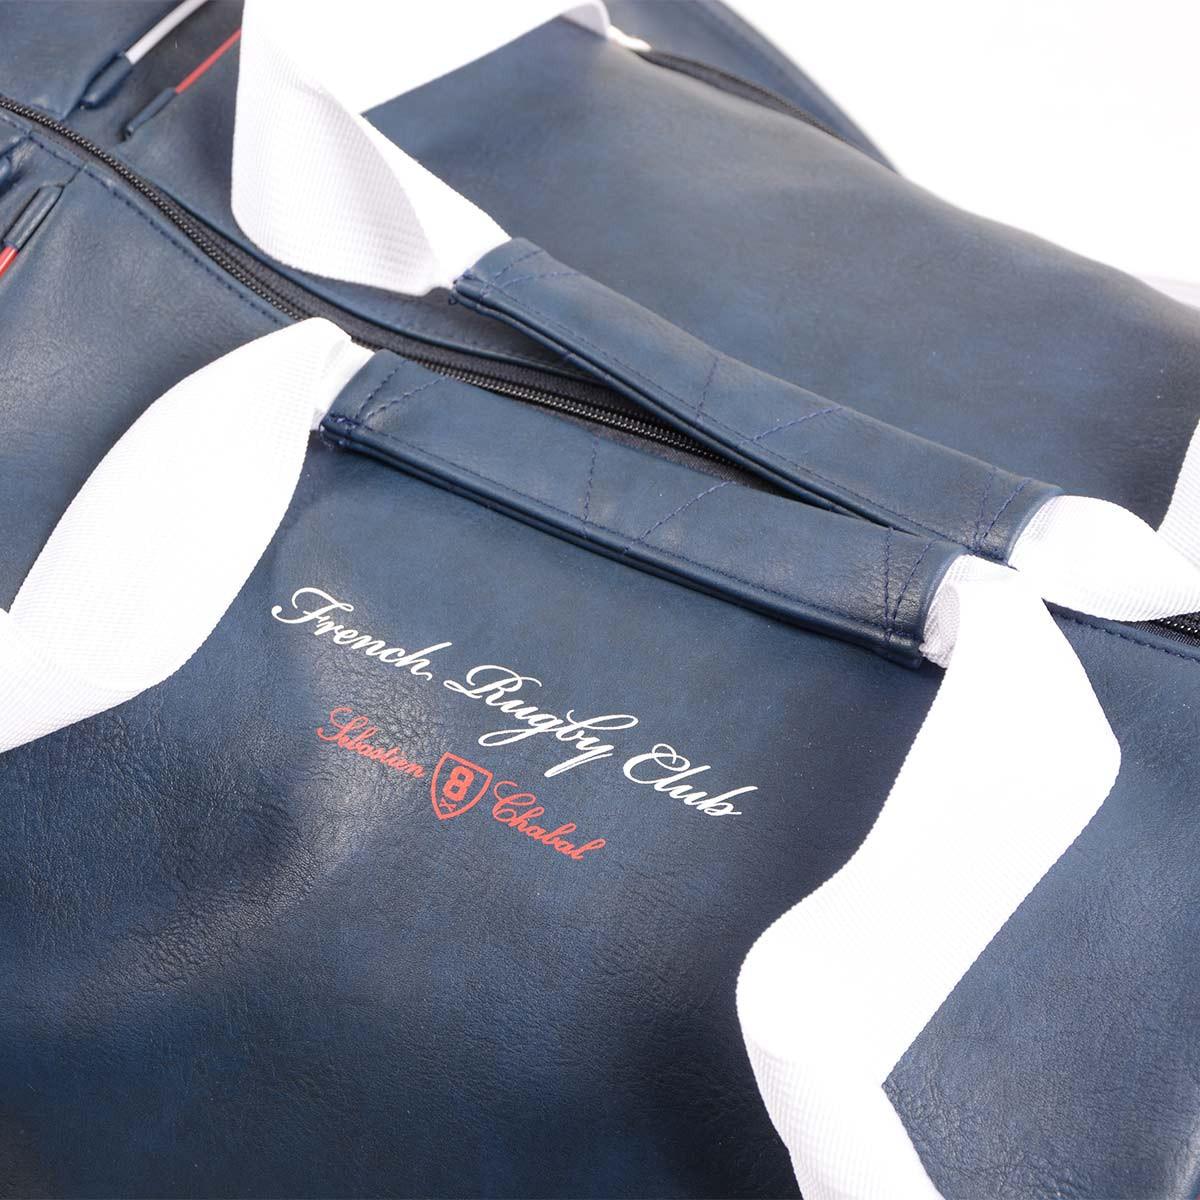 sac de sport ruckfield france id es cadeaux accessoires homme ruckfield. Black Bedroom Furniture Sets. Home Design Ideas